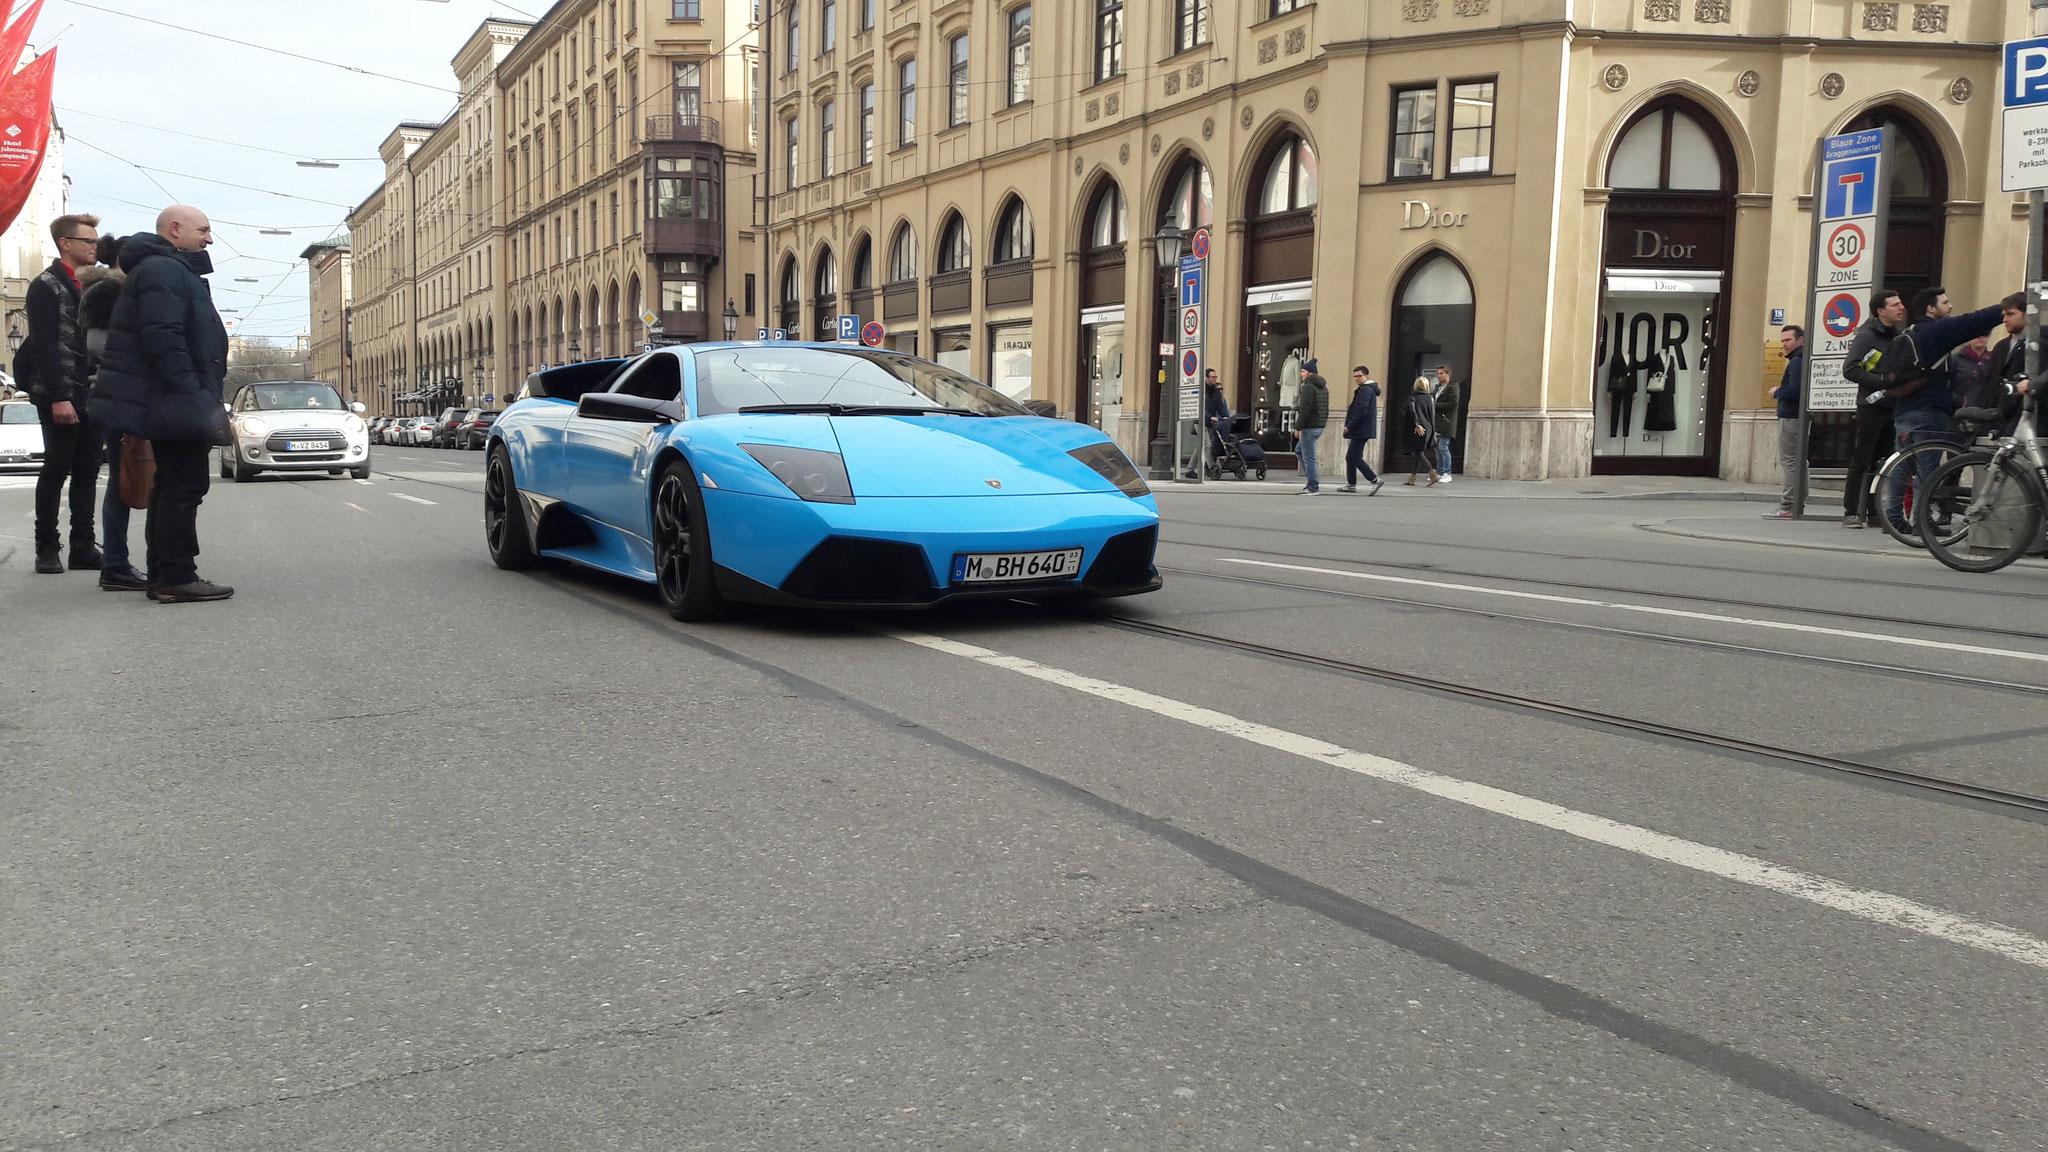 Lamborghini Murcielago - B-BH-640